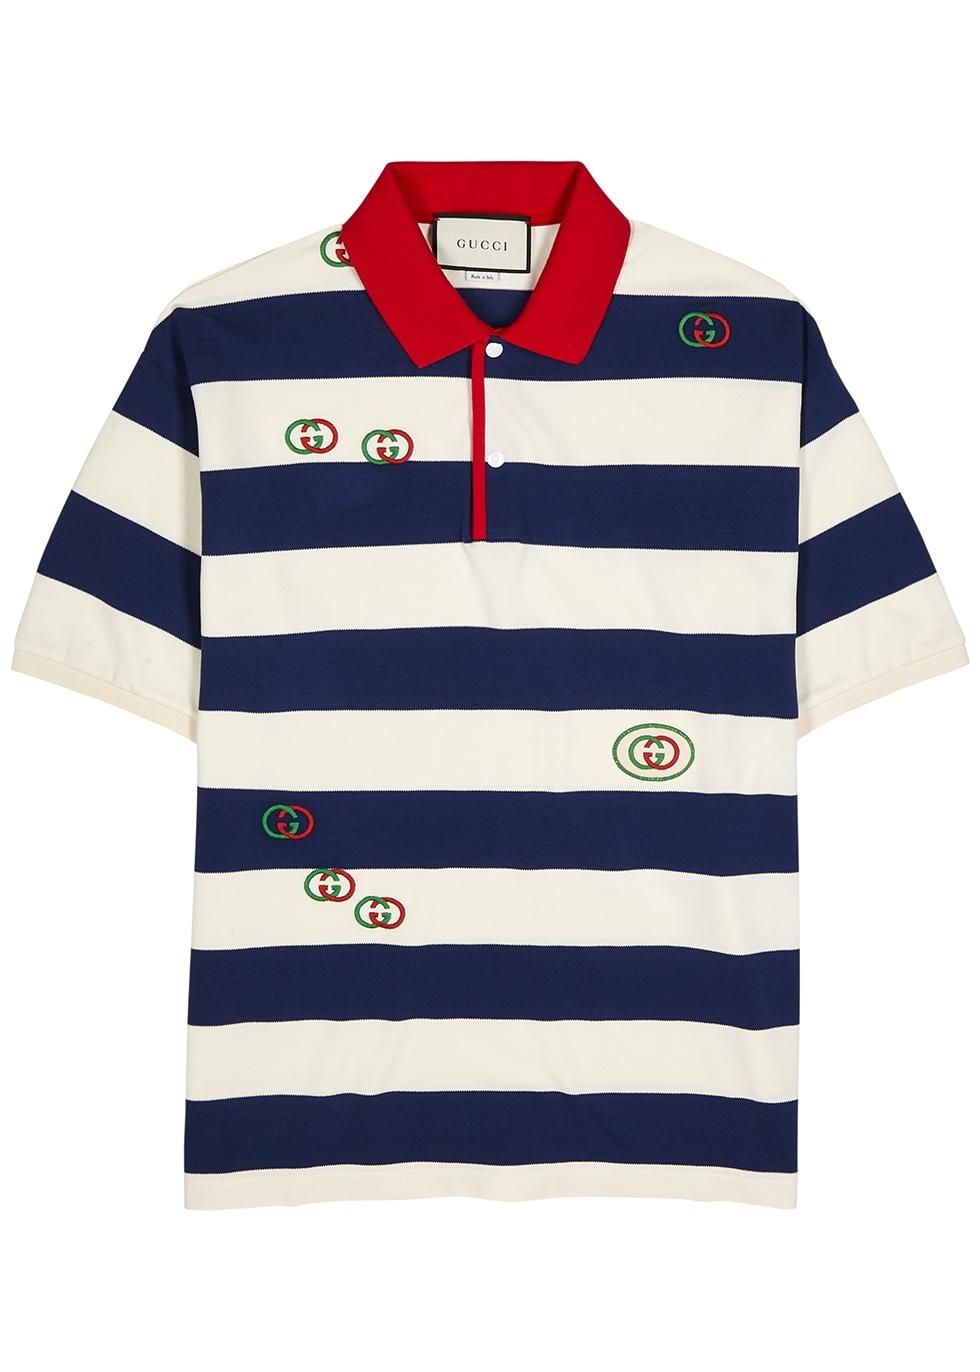 b5774c9df764 Gucci Men's Polo Shirts - Harvey Nichols